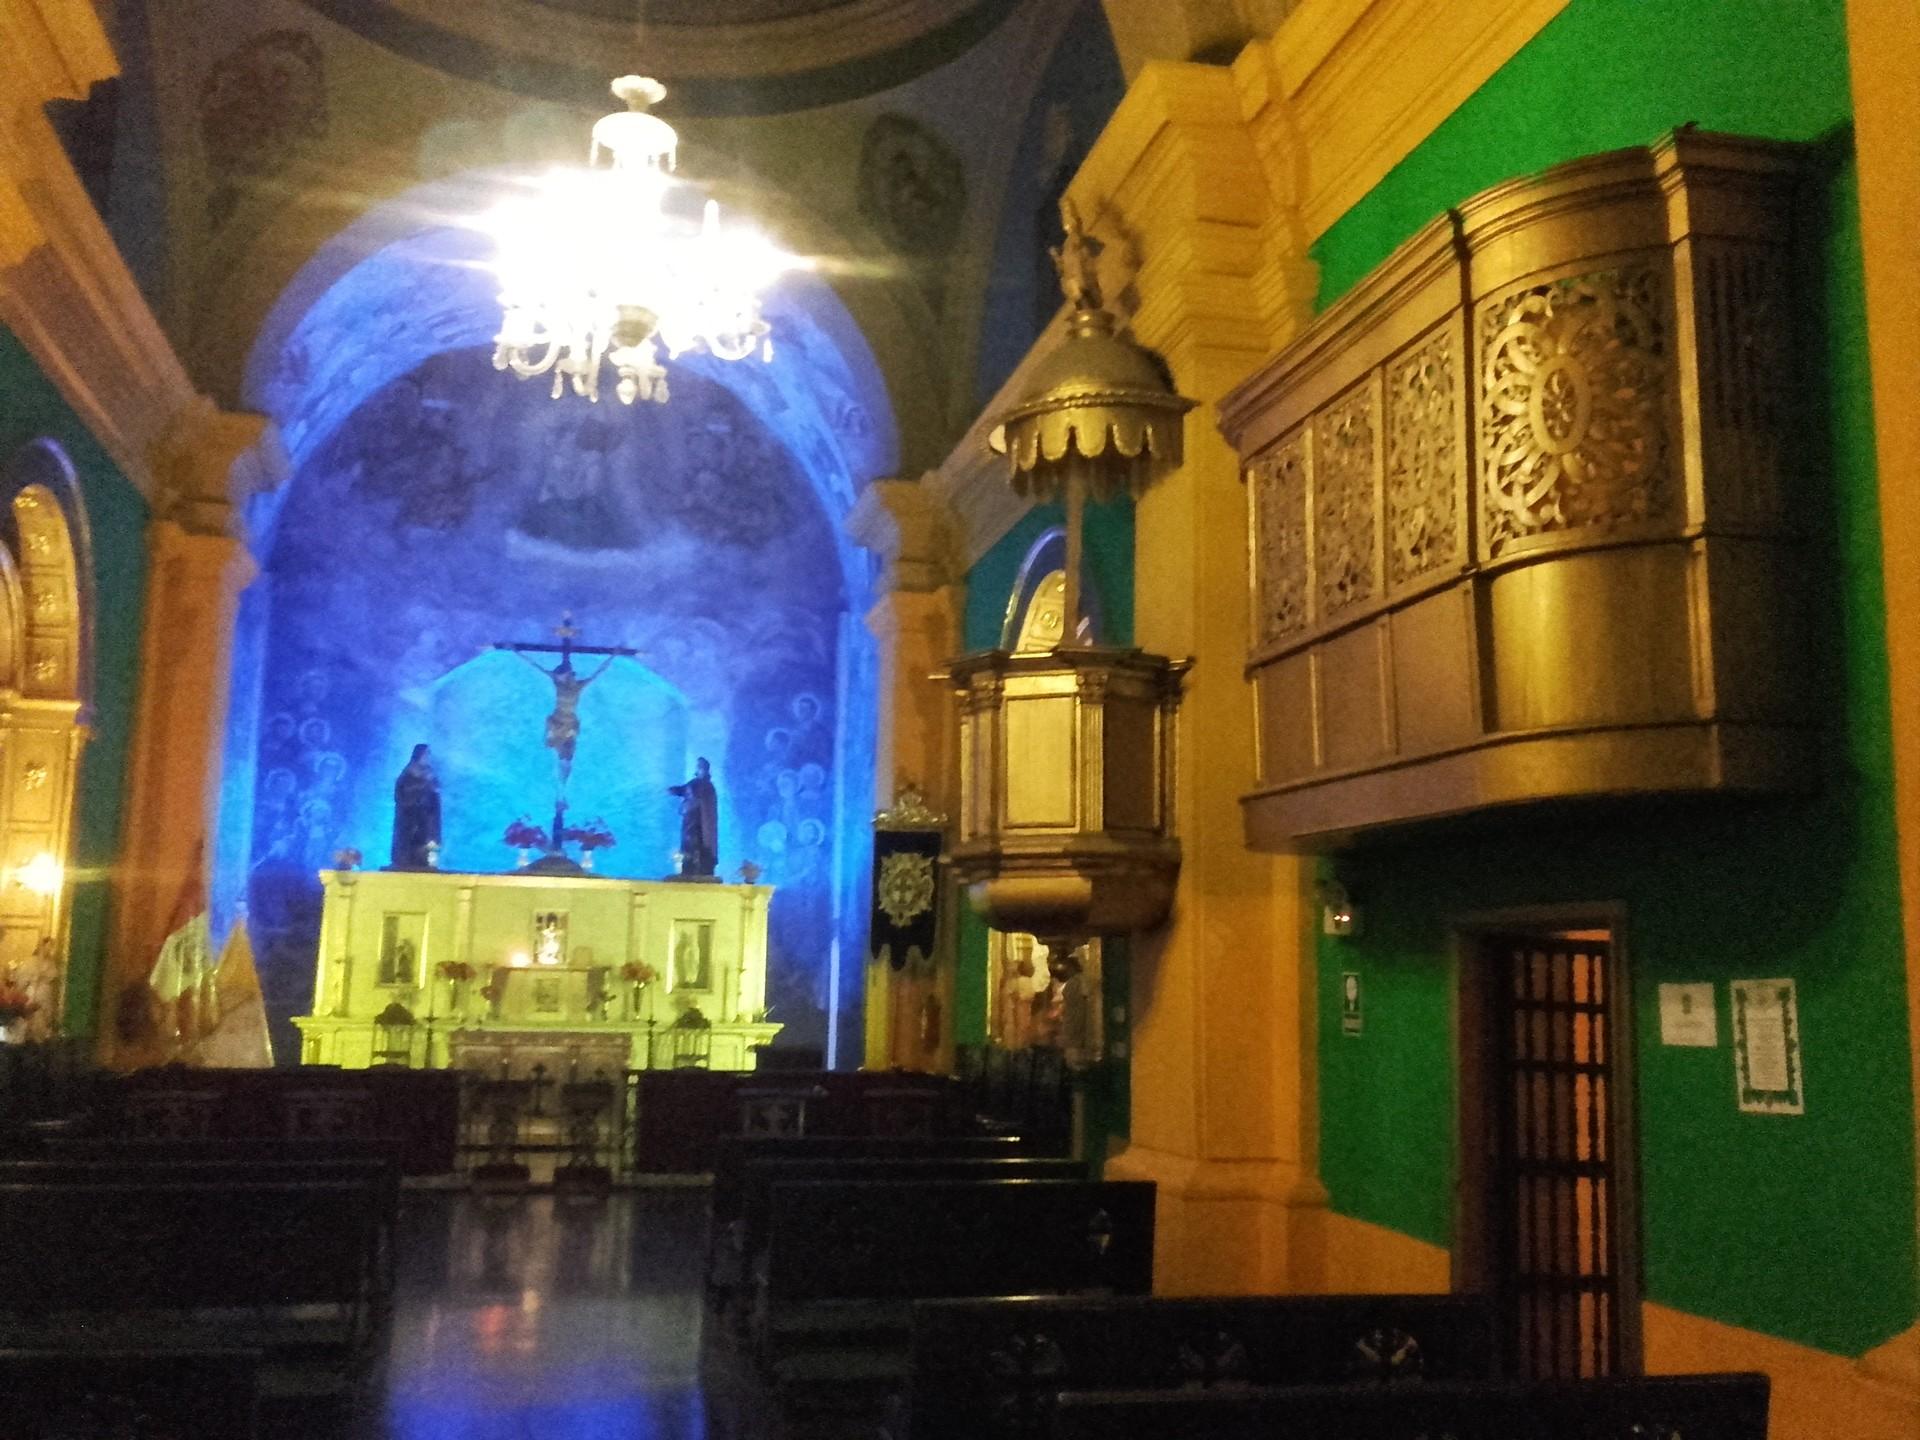 la-capilla-astilla-cruz-jesus-2268db4bca